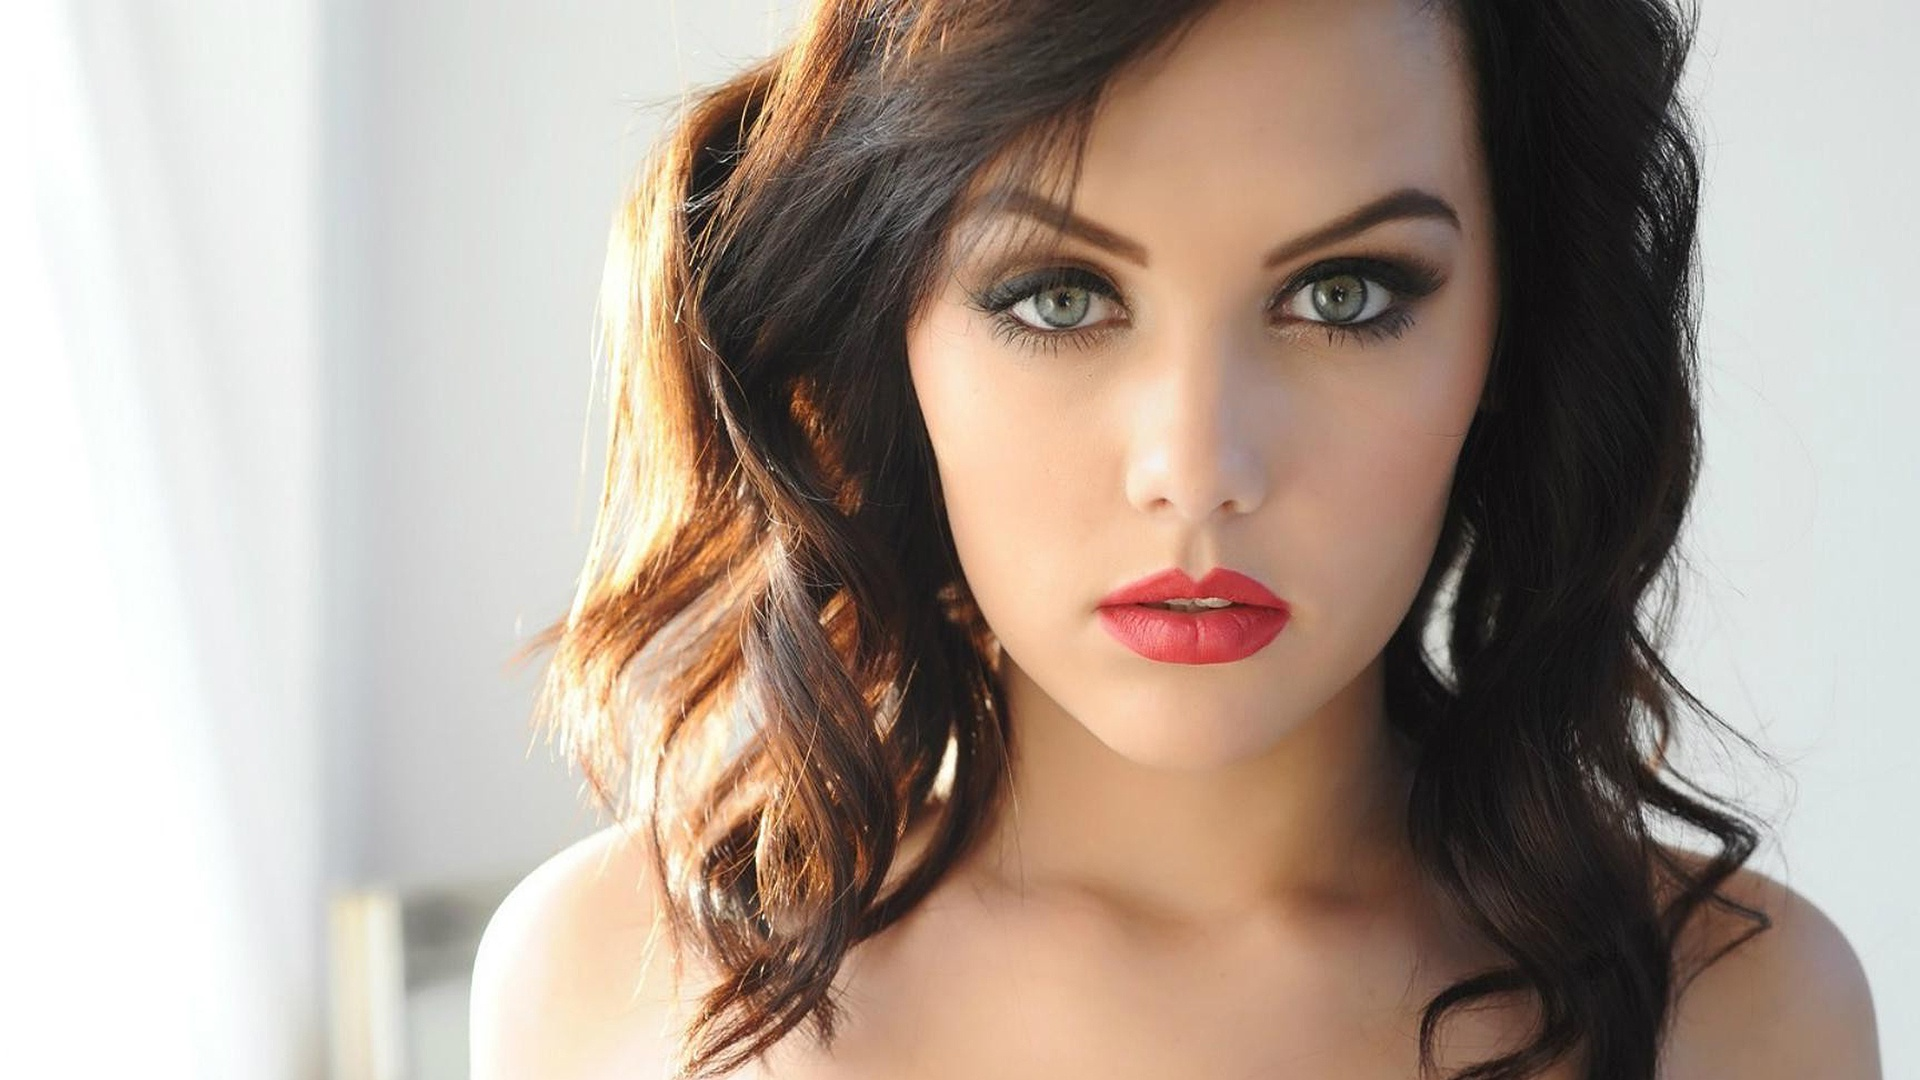 xxx nude images of maria sharapova